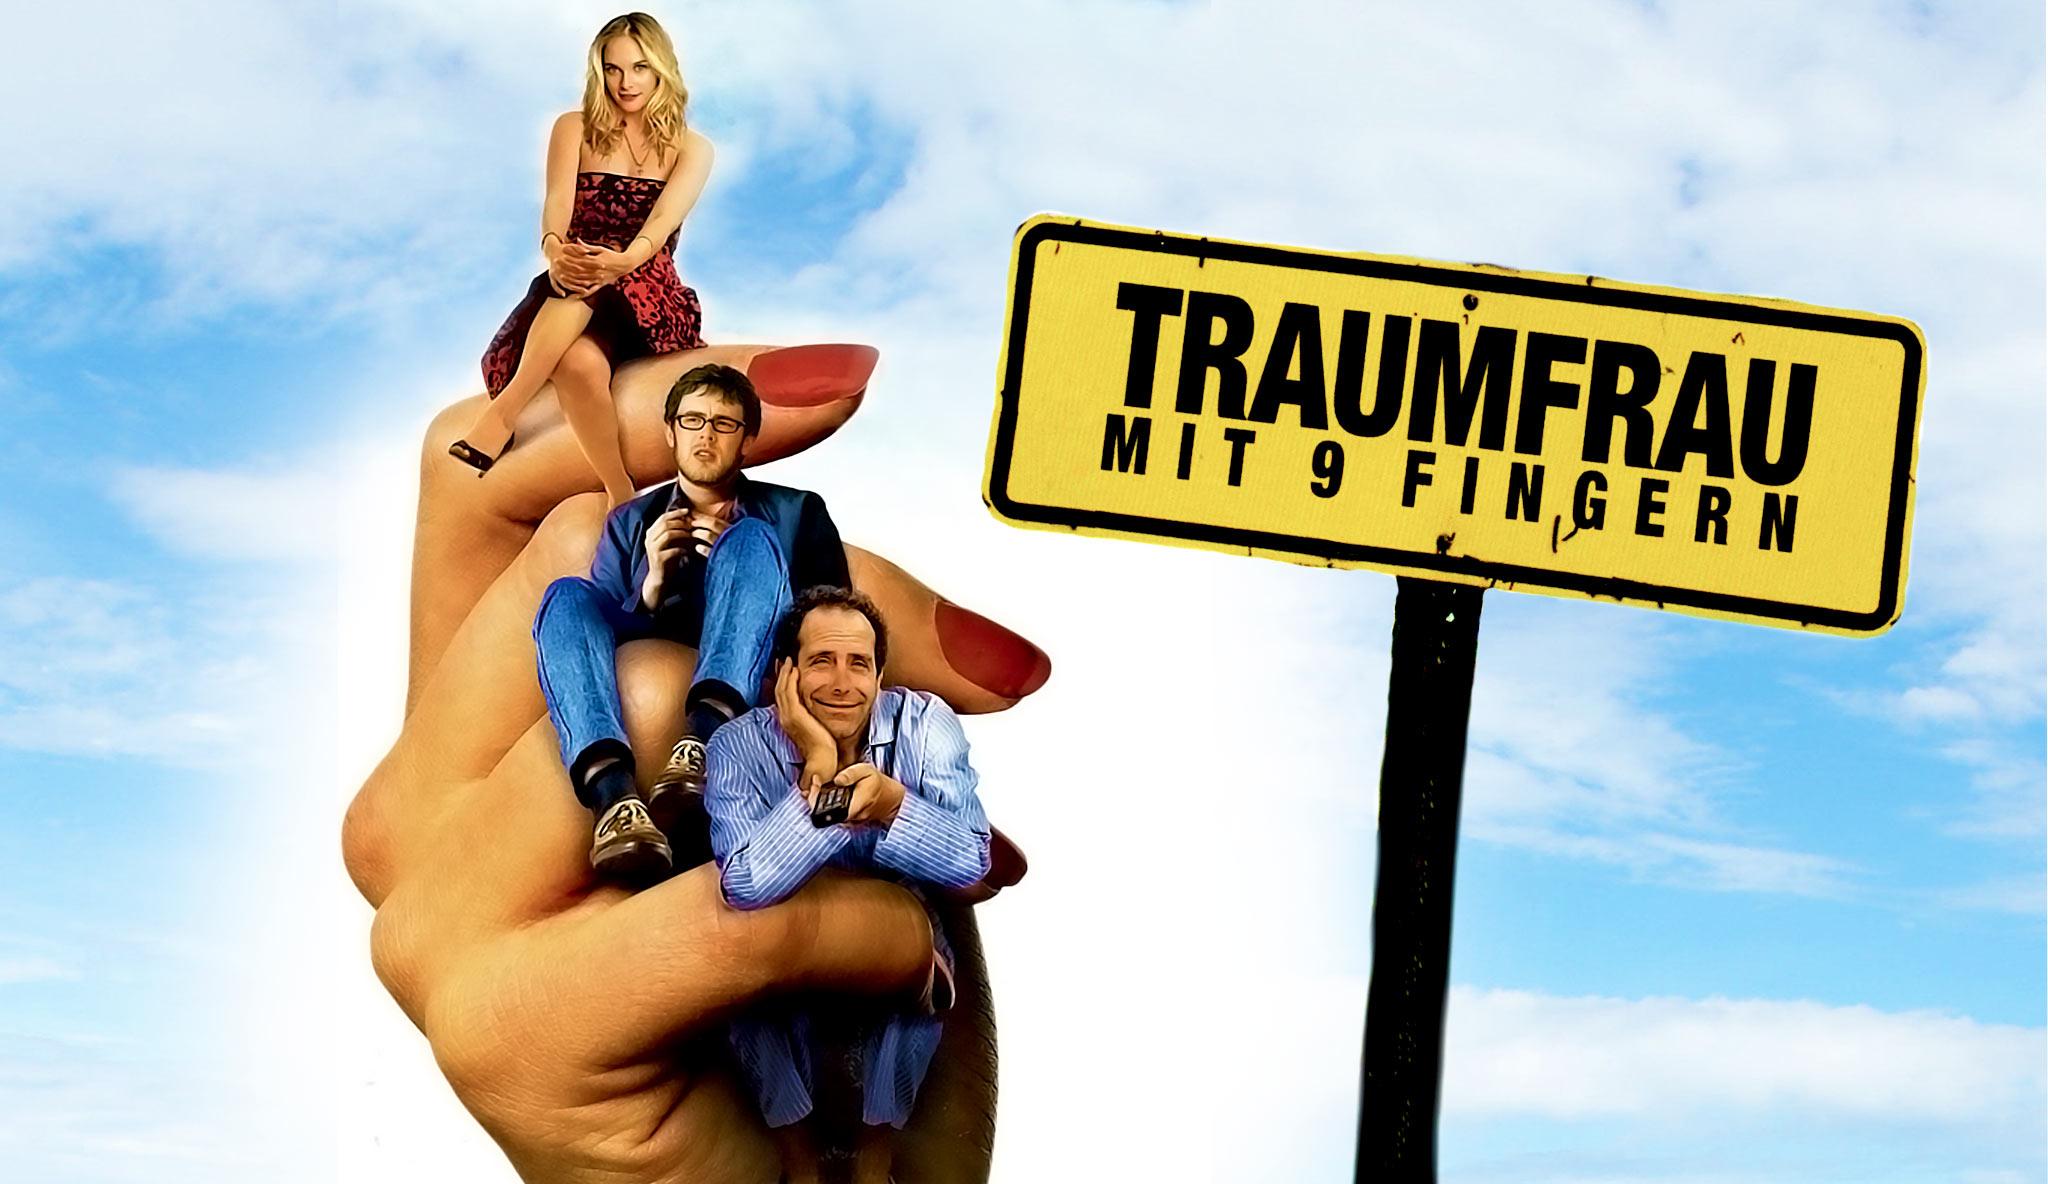 traumfrau-mit-9-fingern\header.jpg